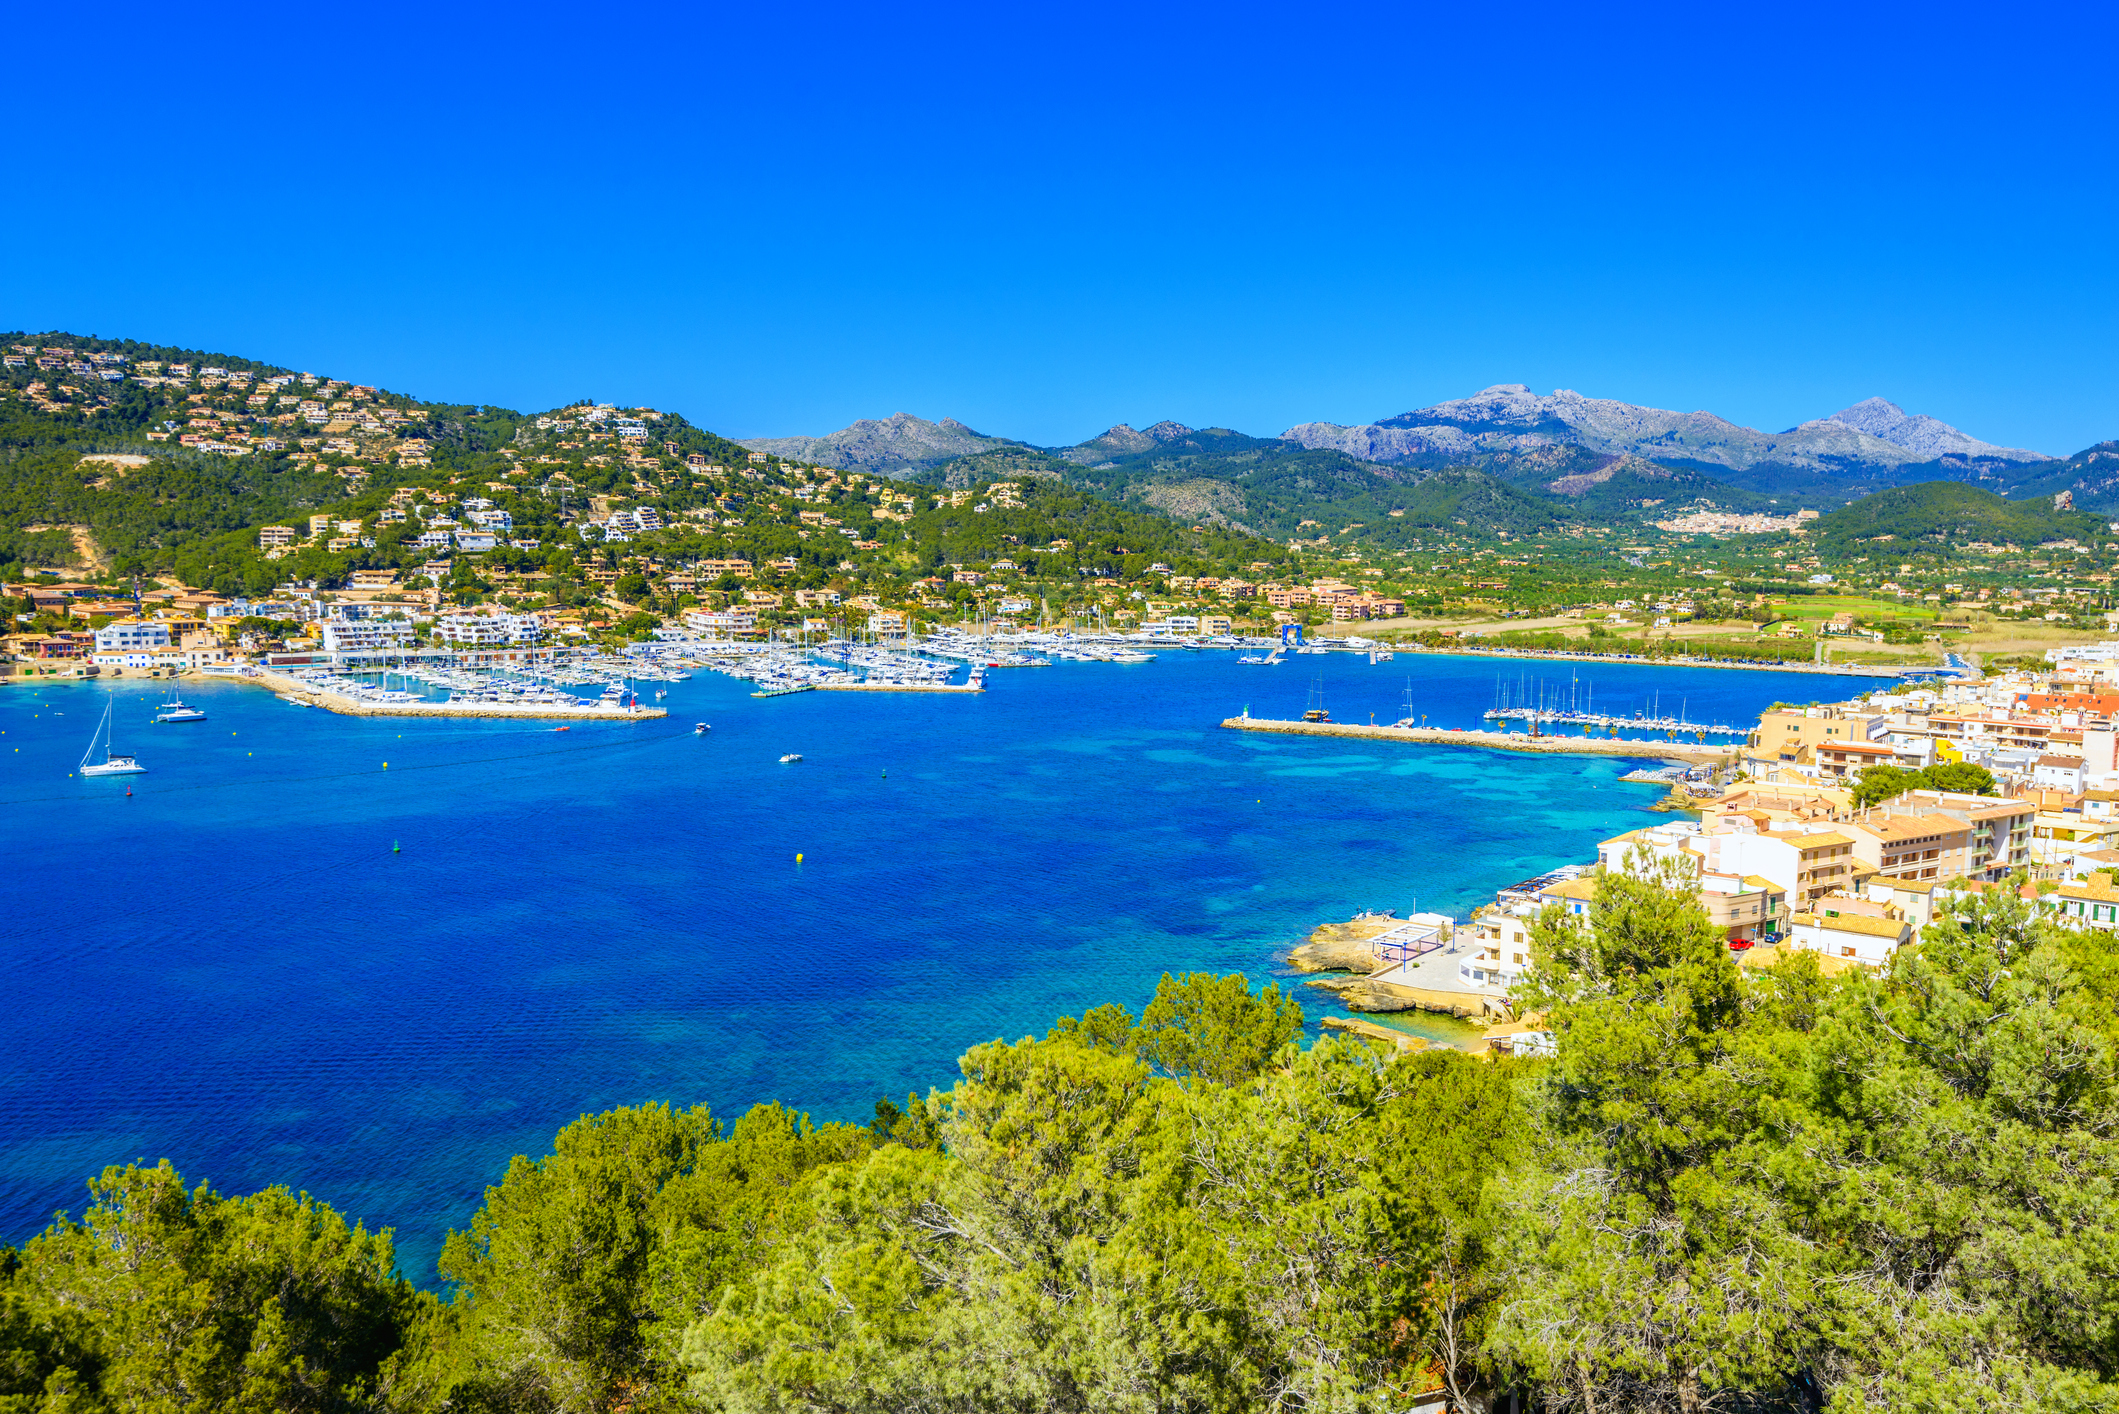 The beautiful Port Andratx